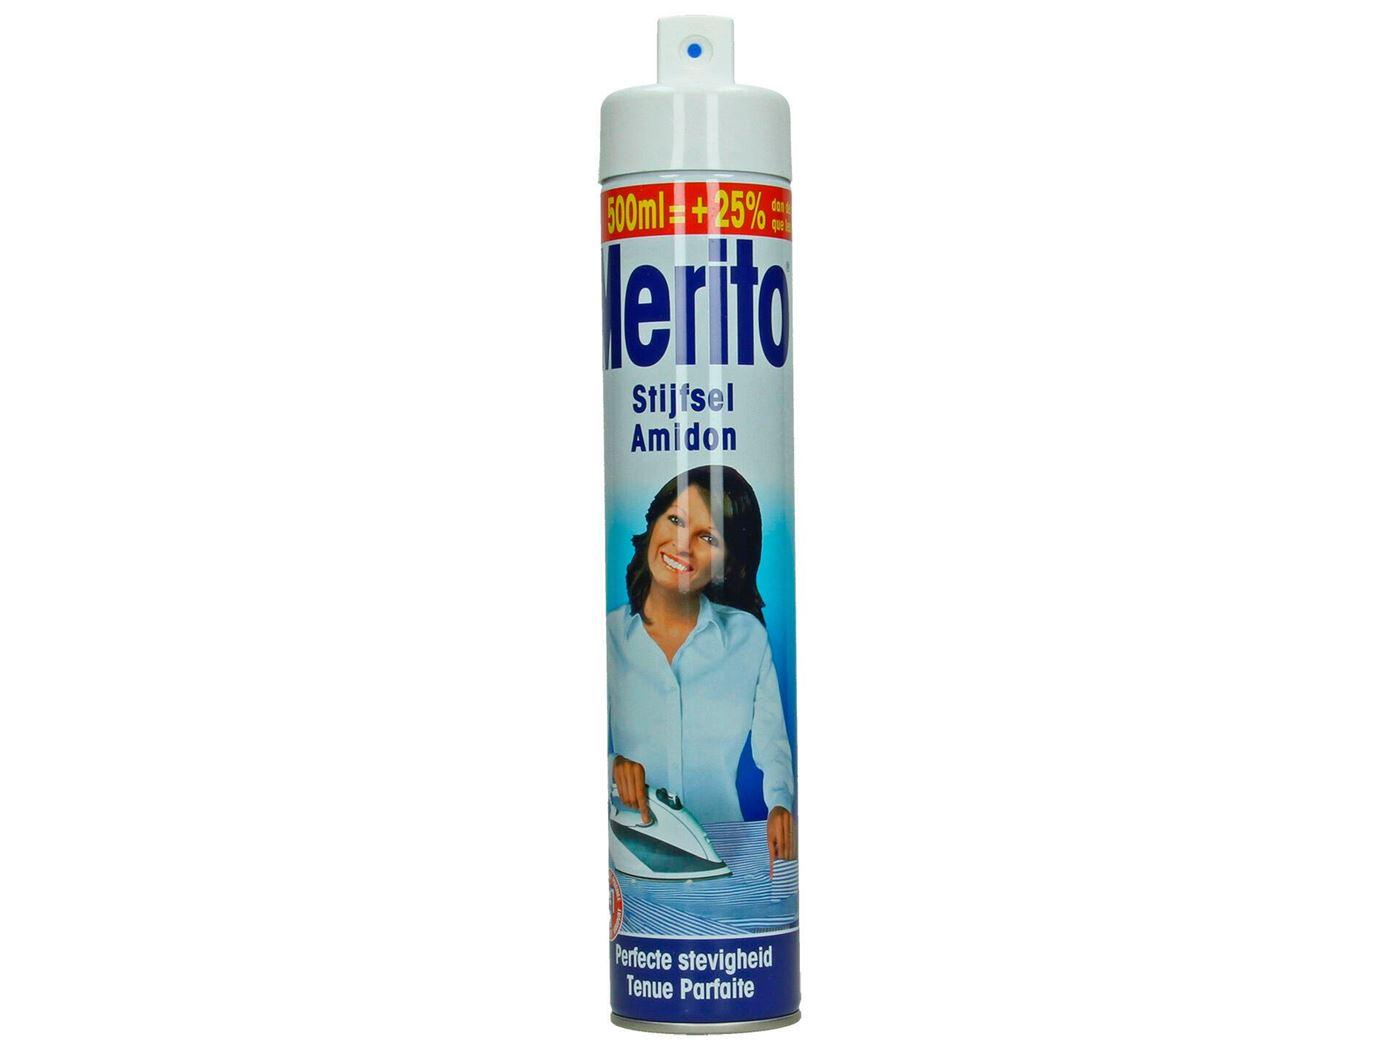 merito spray stijfsel